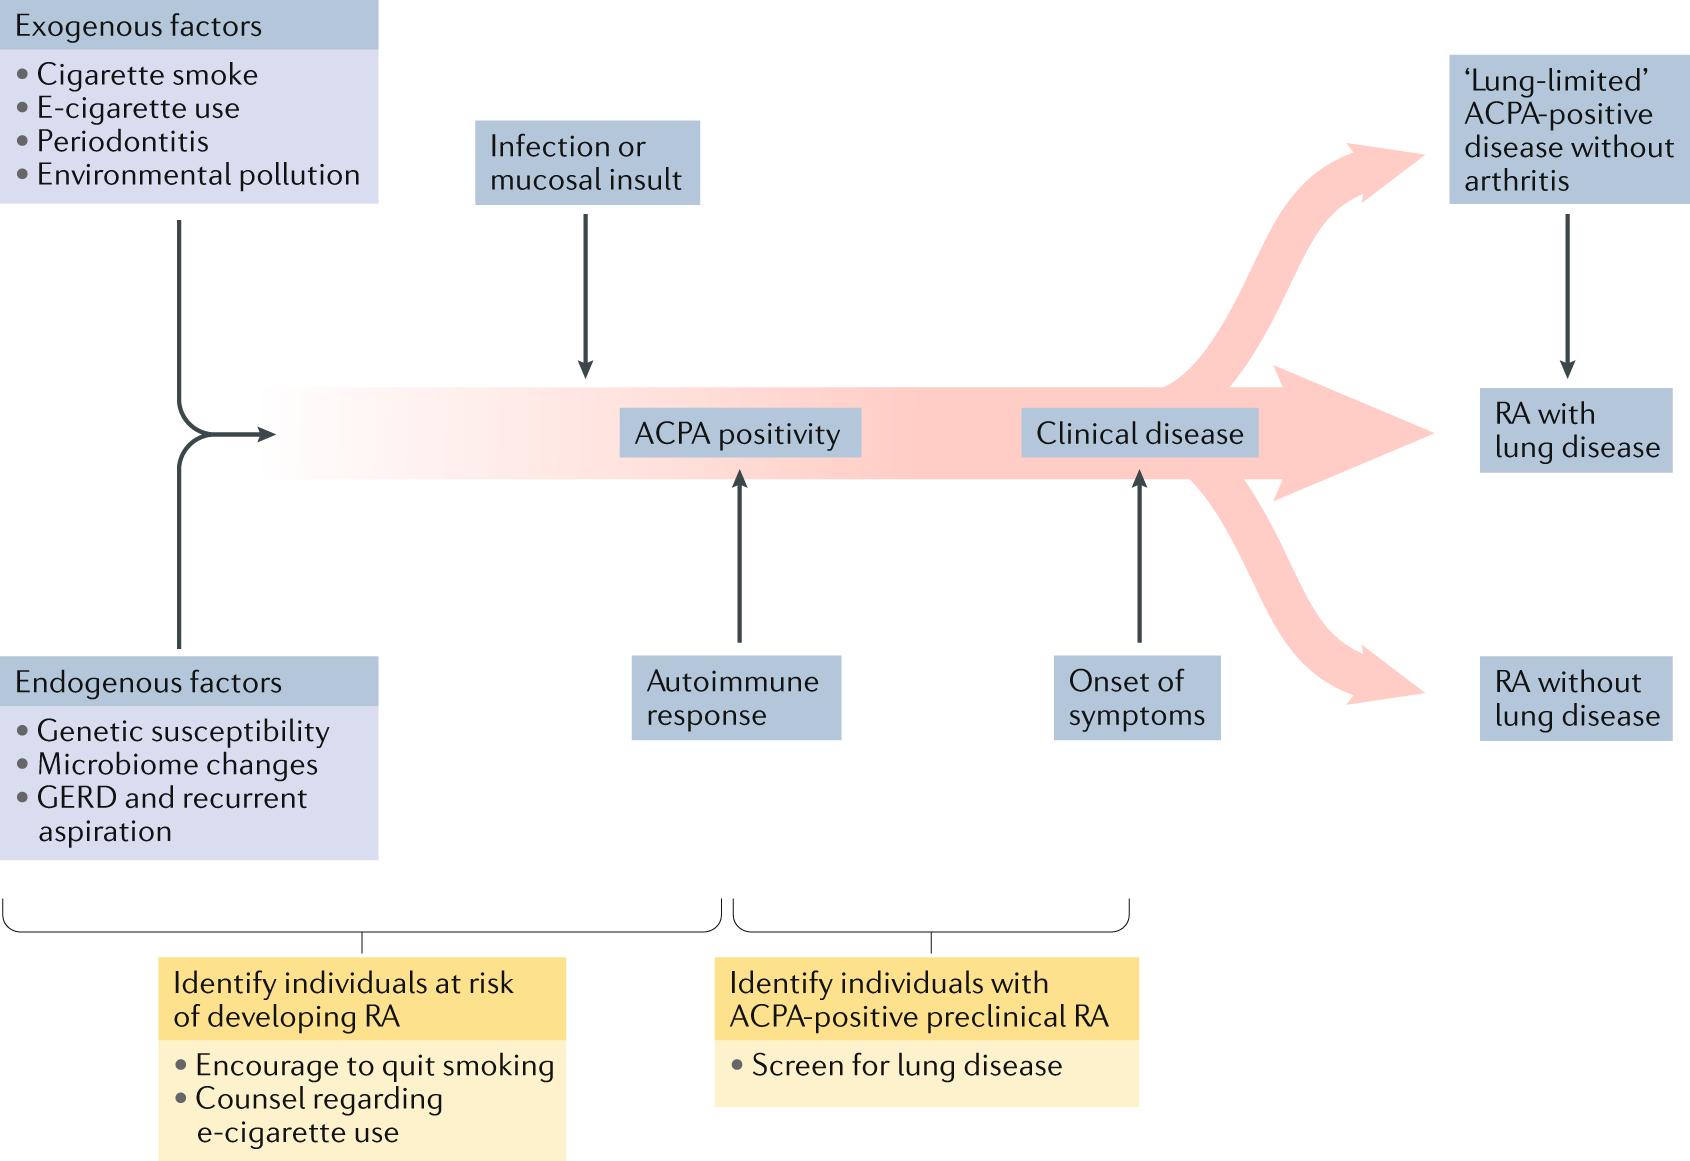 Mechanisms of lung disease development in rheumatoid arthritis